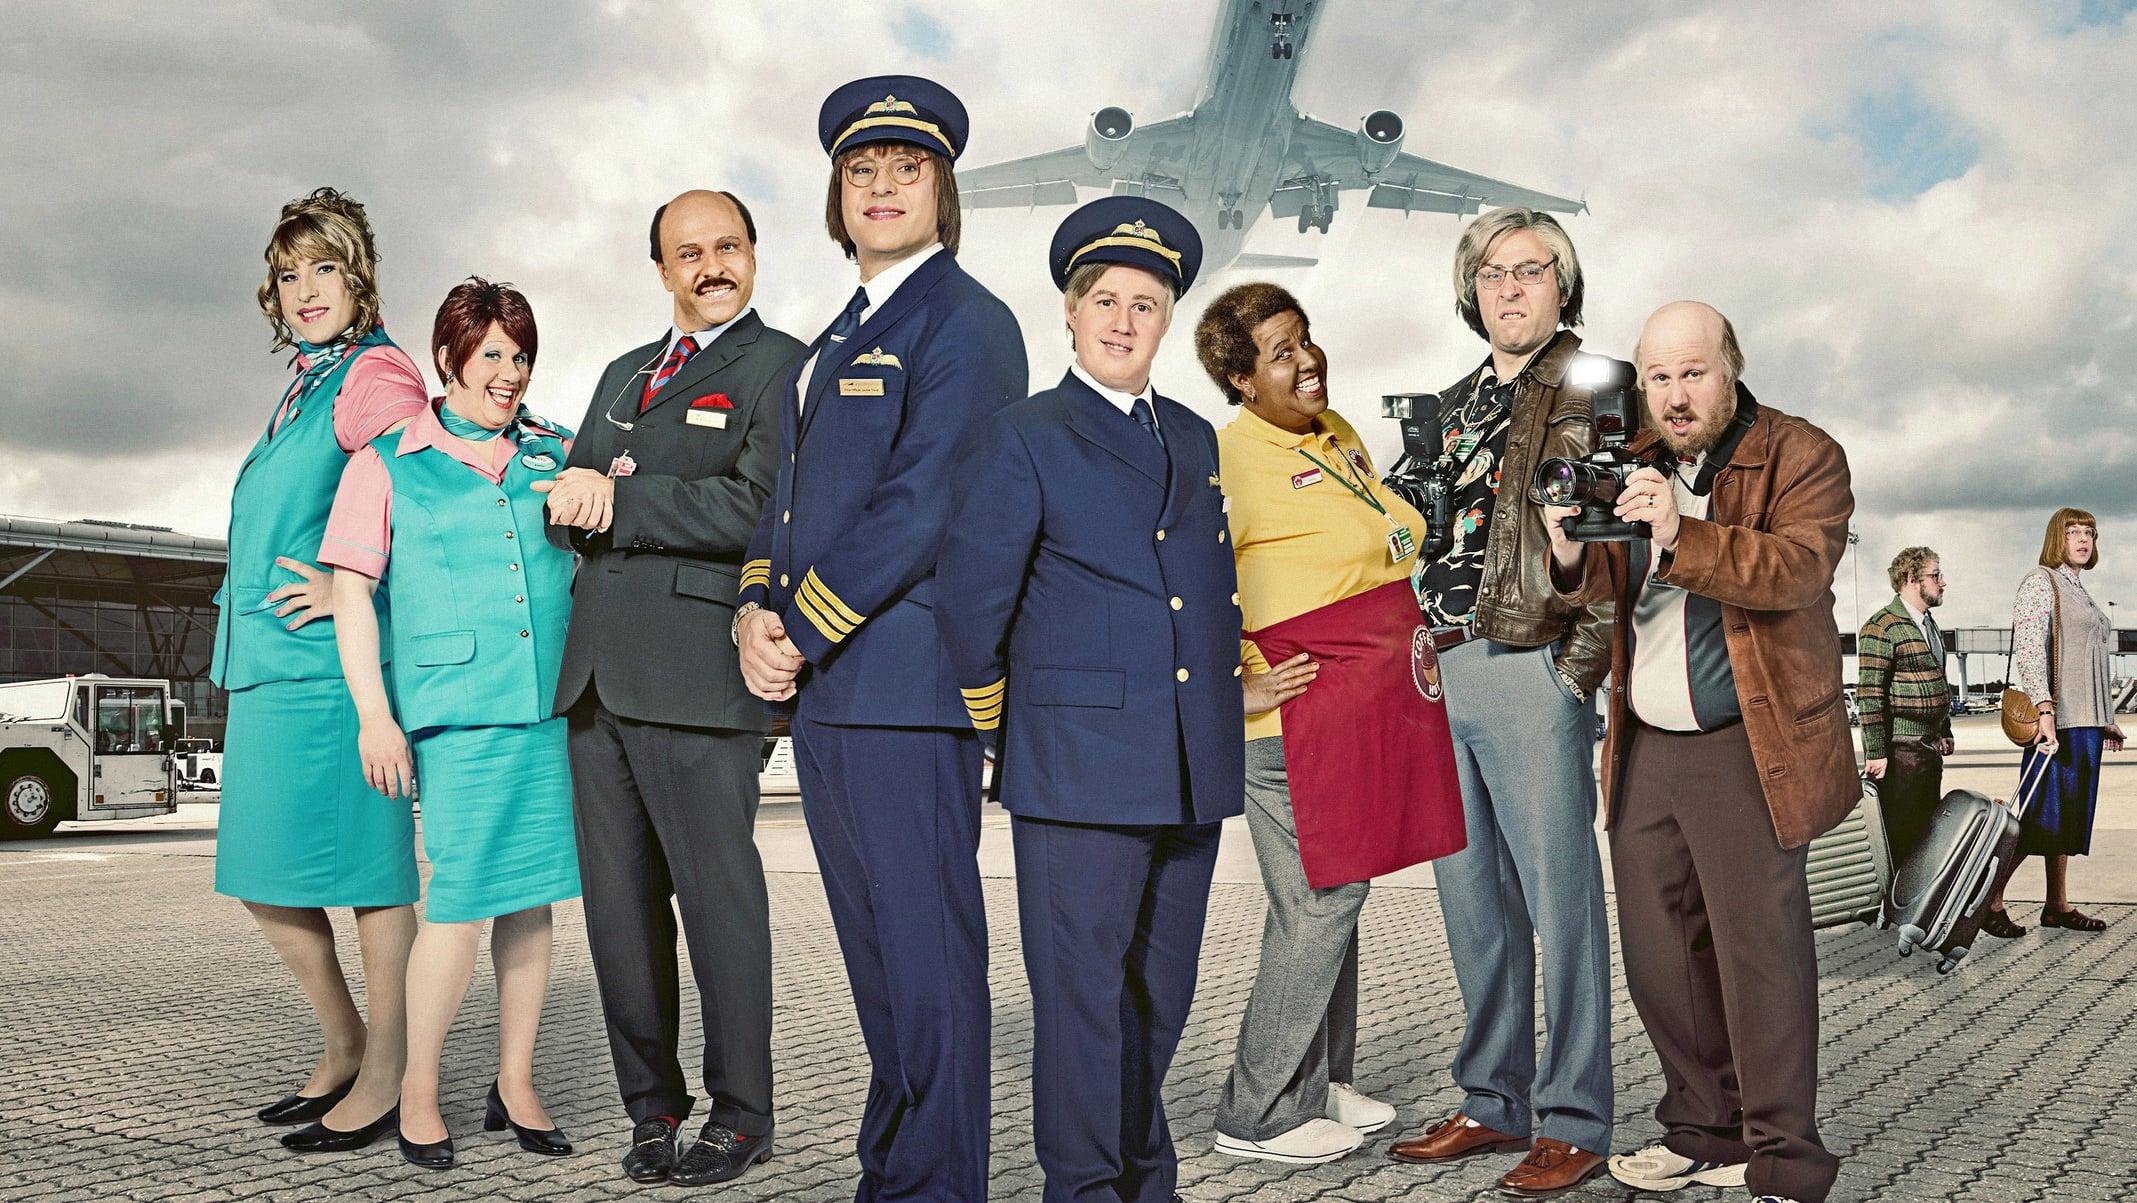 Maak kans op de complete serie Come Fly With Me